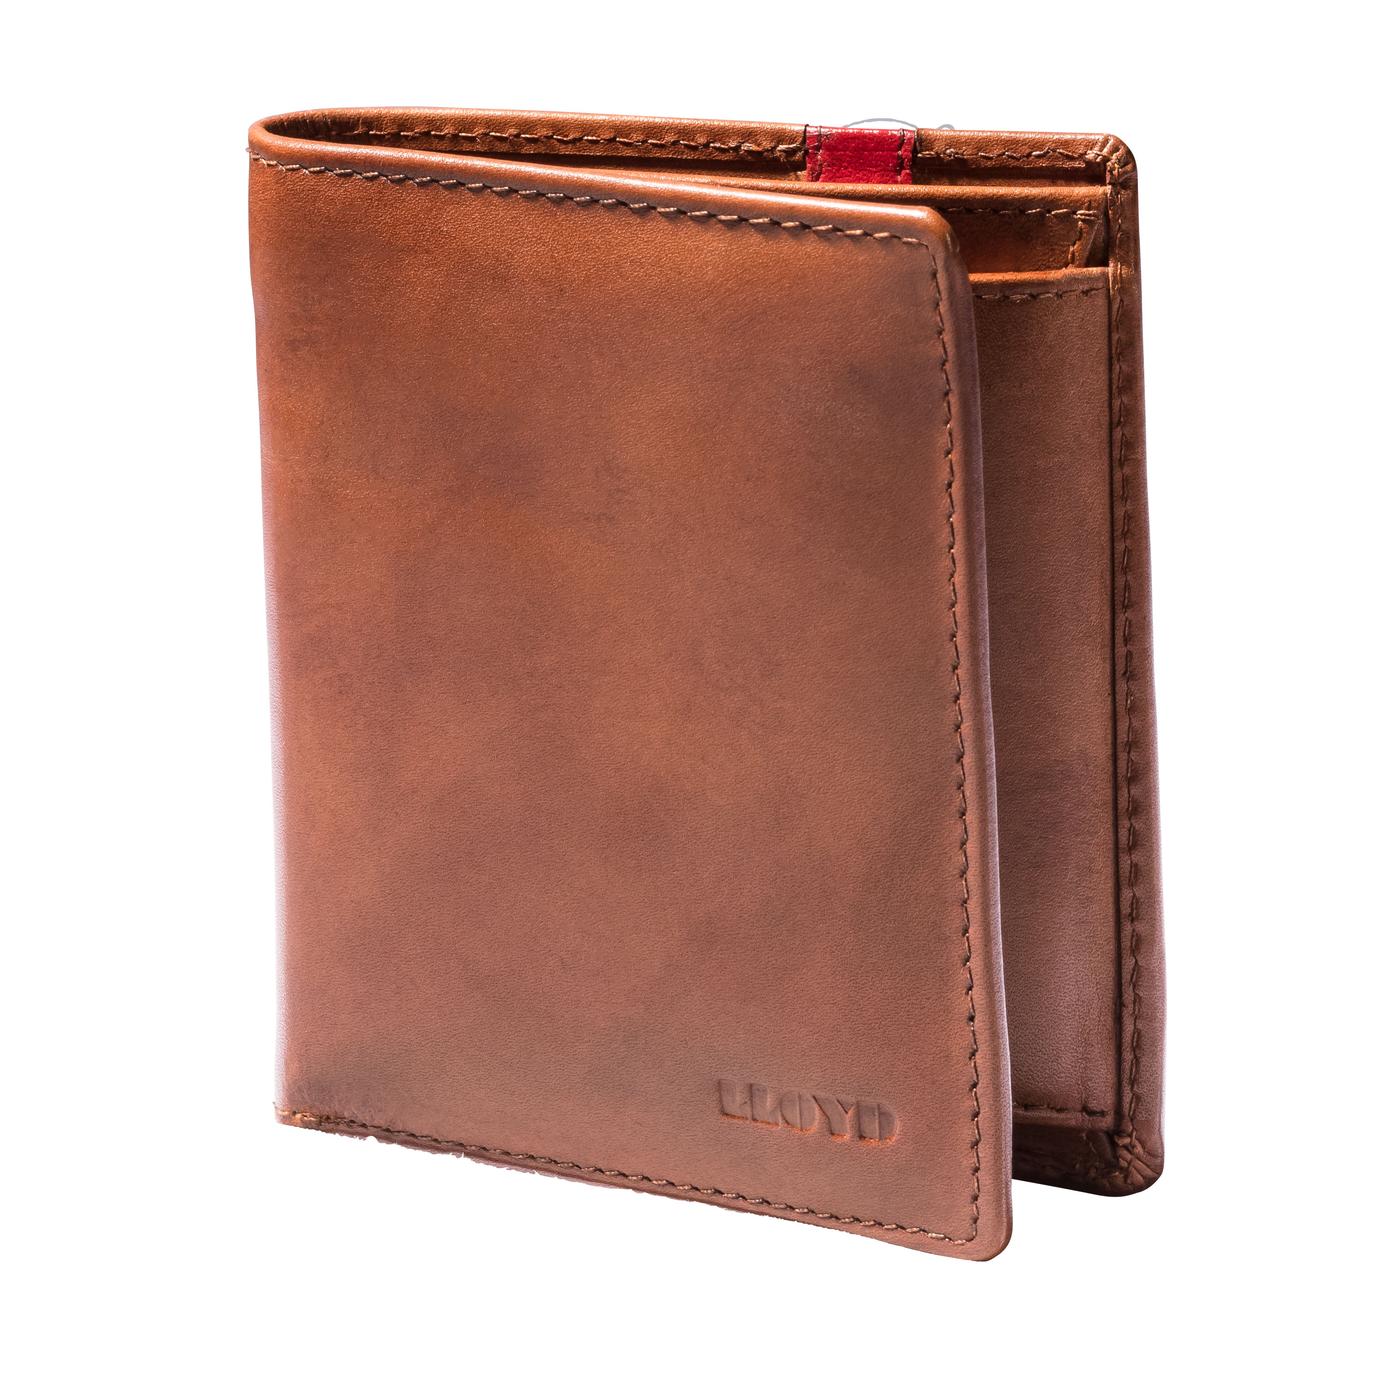 GELDBÖRSE | Accessoires > Portemonnaies > Geldbörsen | Braun | Glattleder -  polyester (100%) | LLOYD